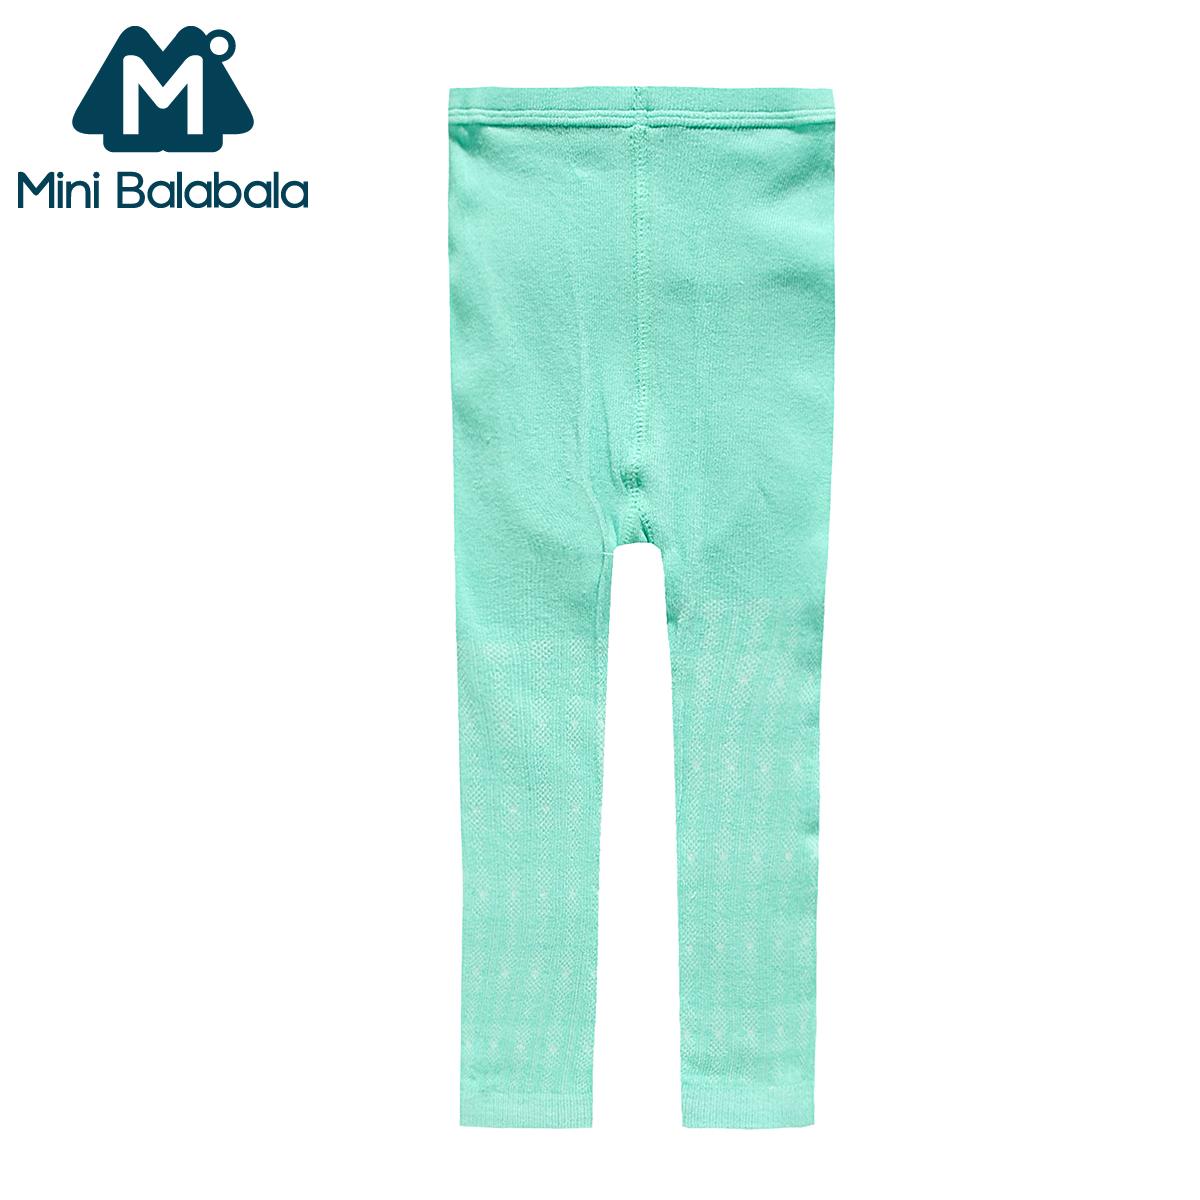 детские носки Mini balabala 51115410611 2015